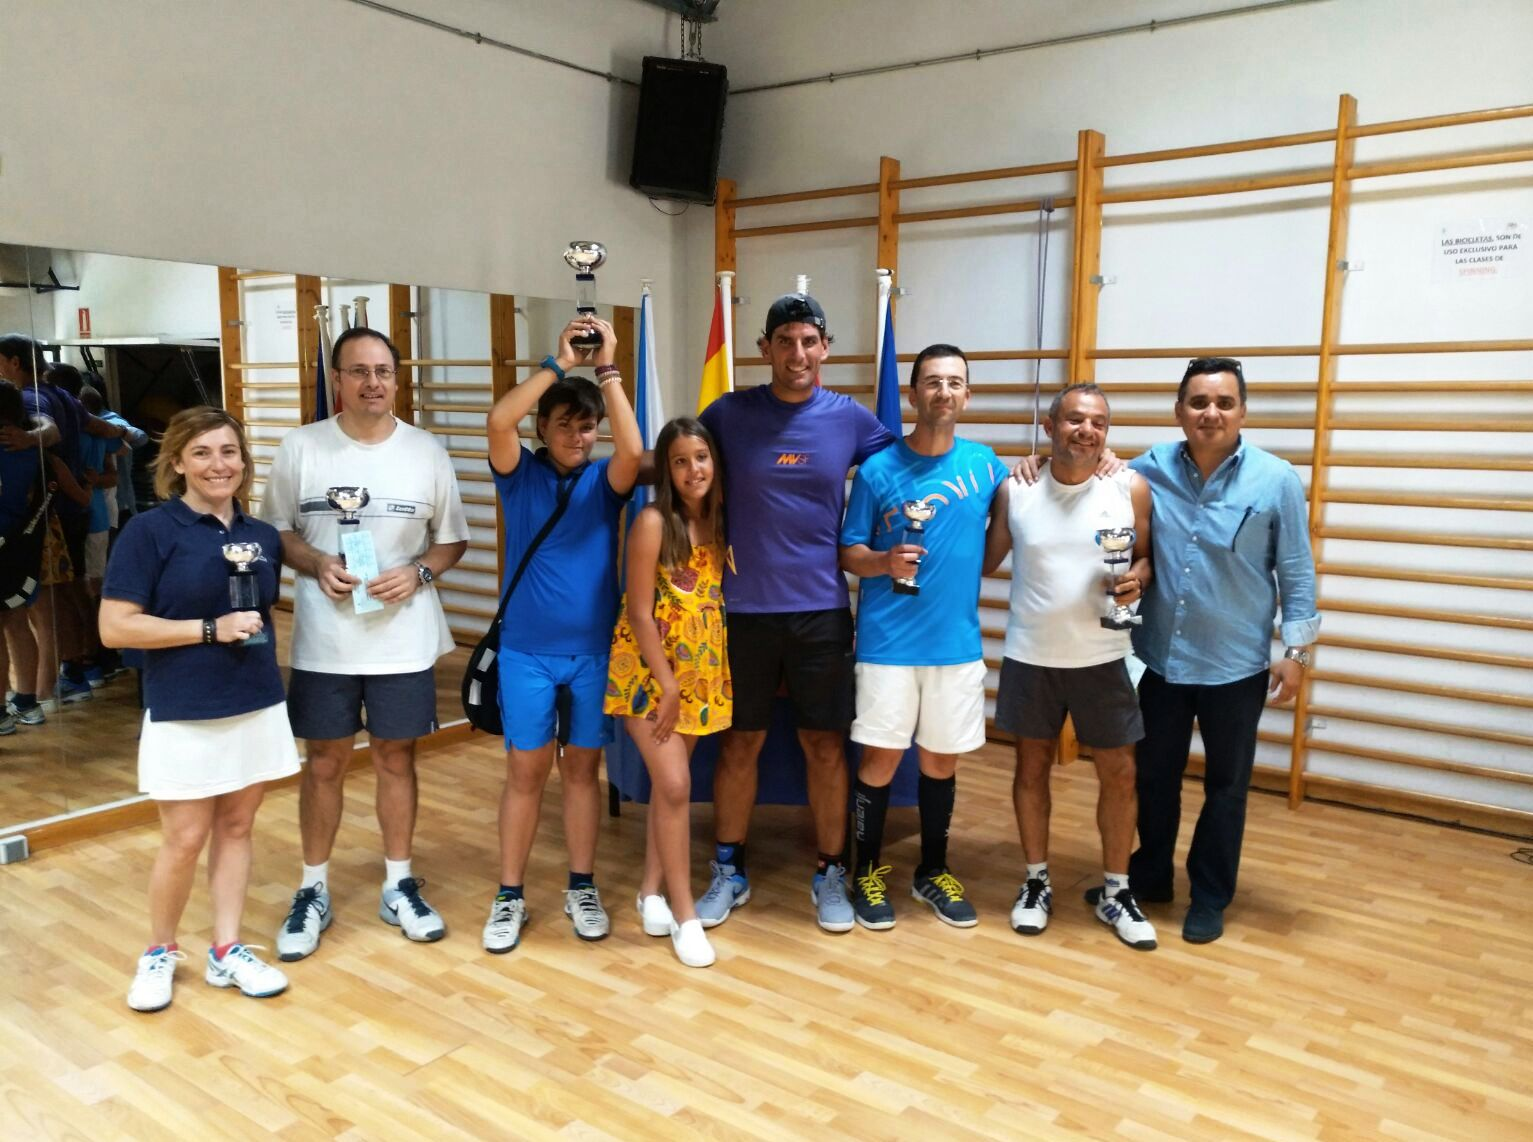 2017 Trofeo Primavera Tenis Velilla